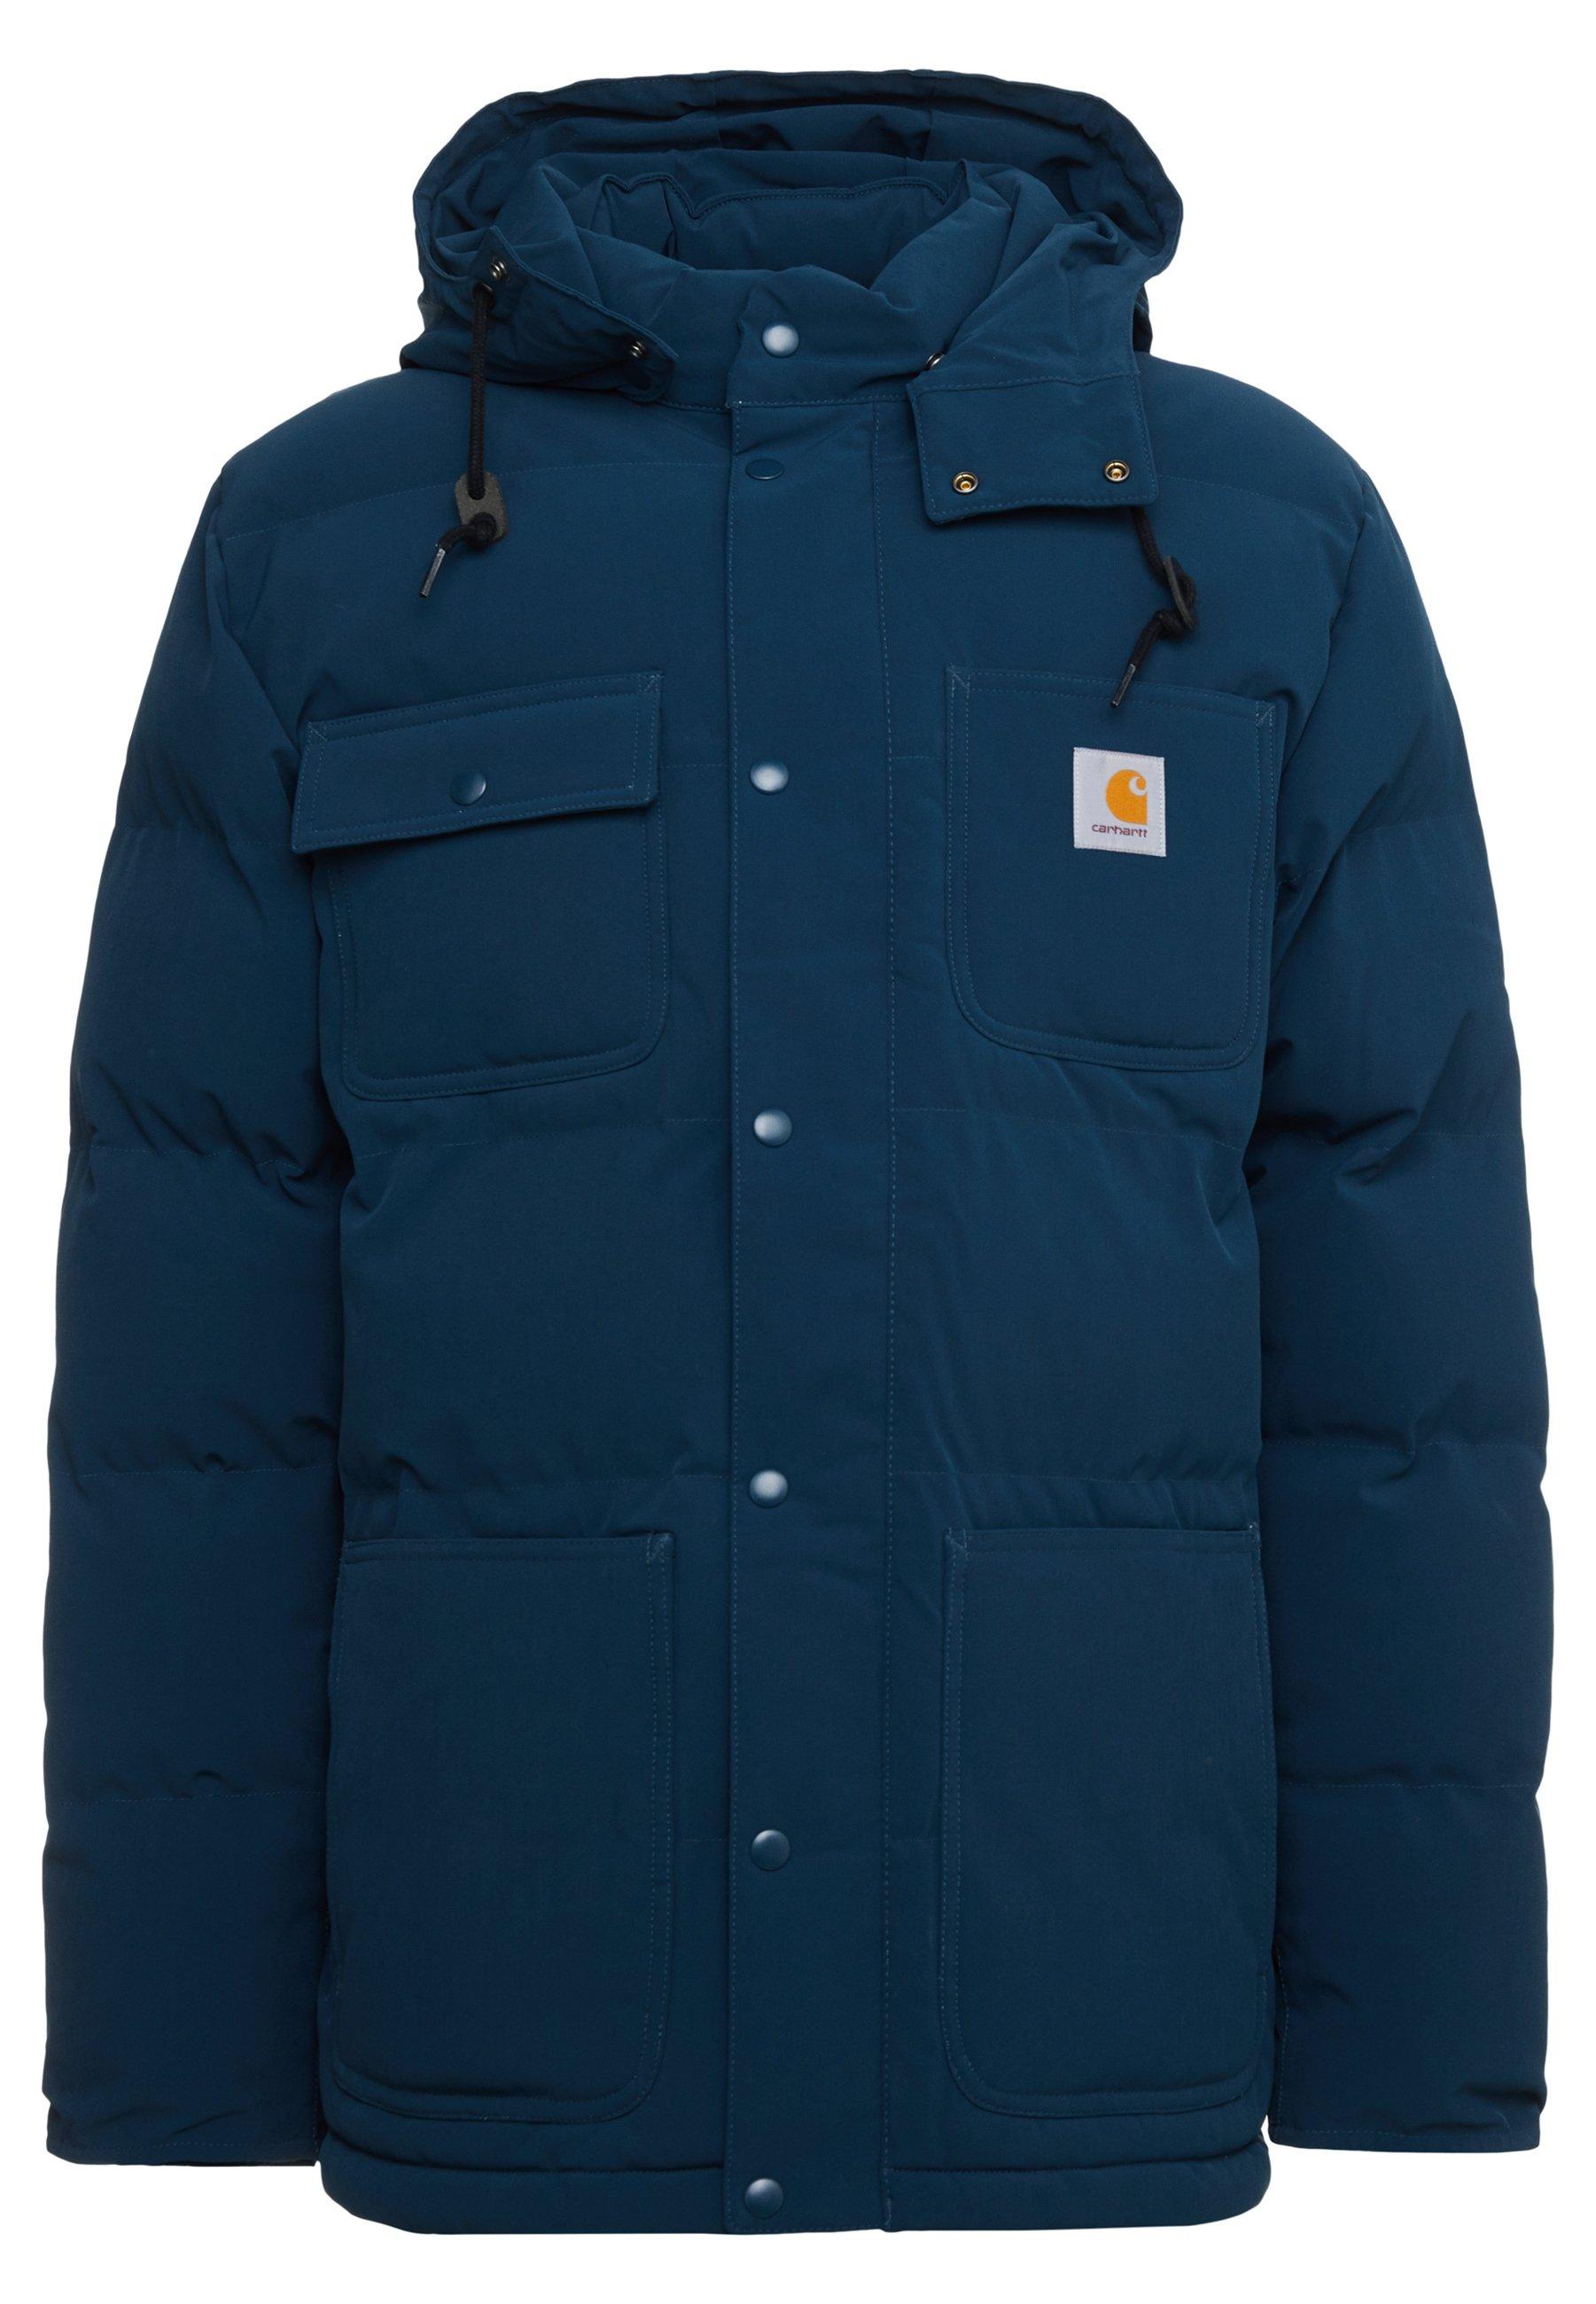 Carhartt Alpine heavyweigt manteau d/'hiver-Marine Foncé//Hamilton Brown RRP £ 255